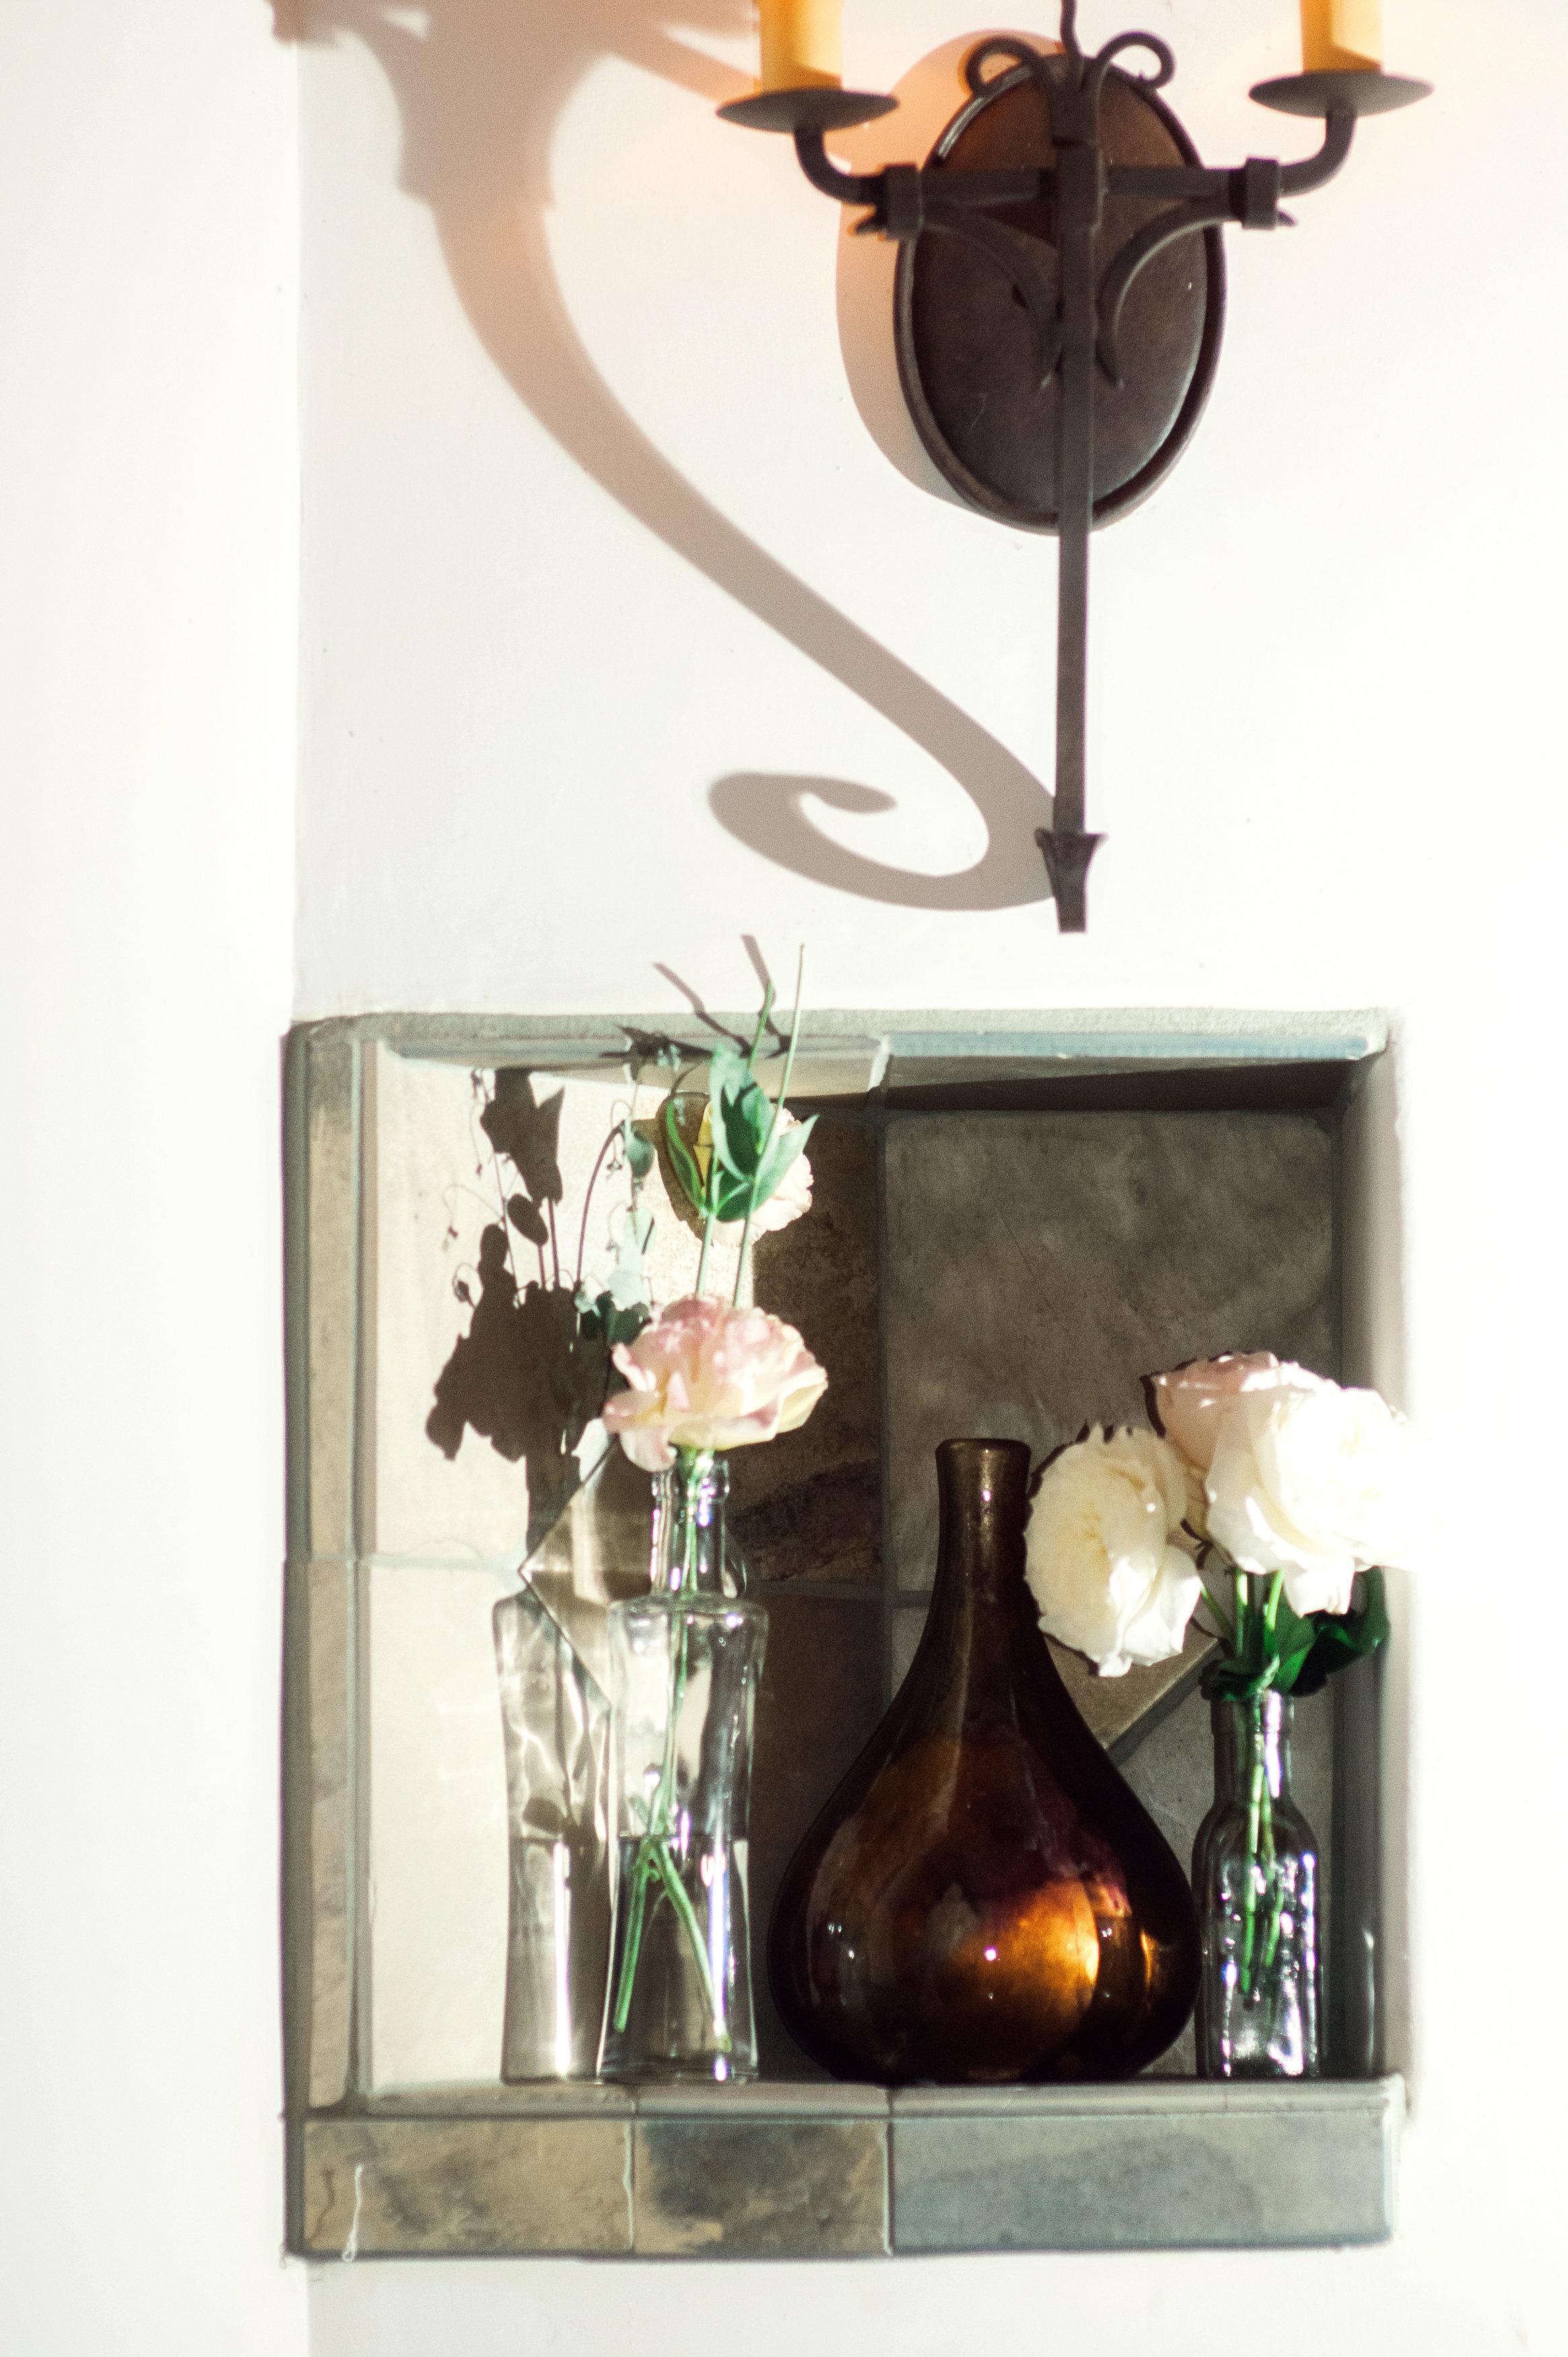 santabarbarawedding.com | Wisteria Lane Flroal Design Studio | Bride and Groom | Garden Roses | Tea Roses | WeddingDecor